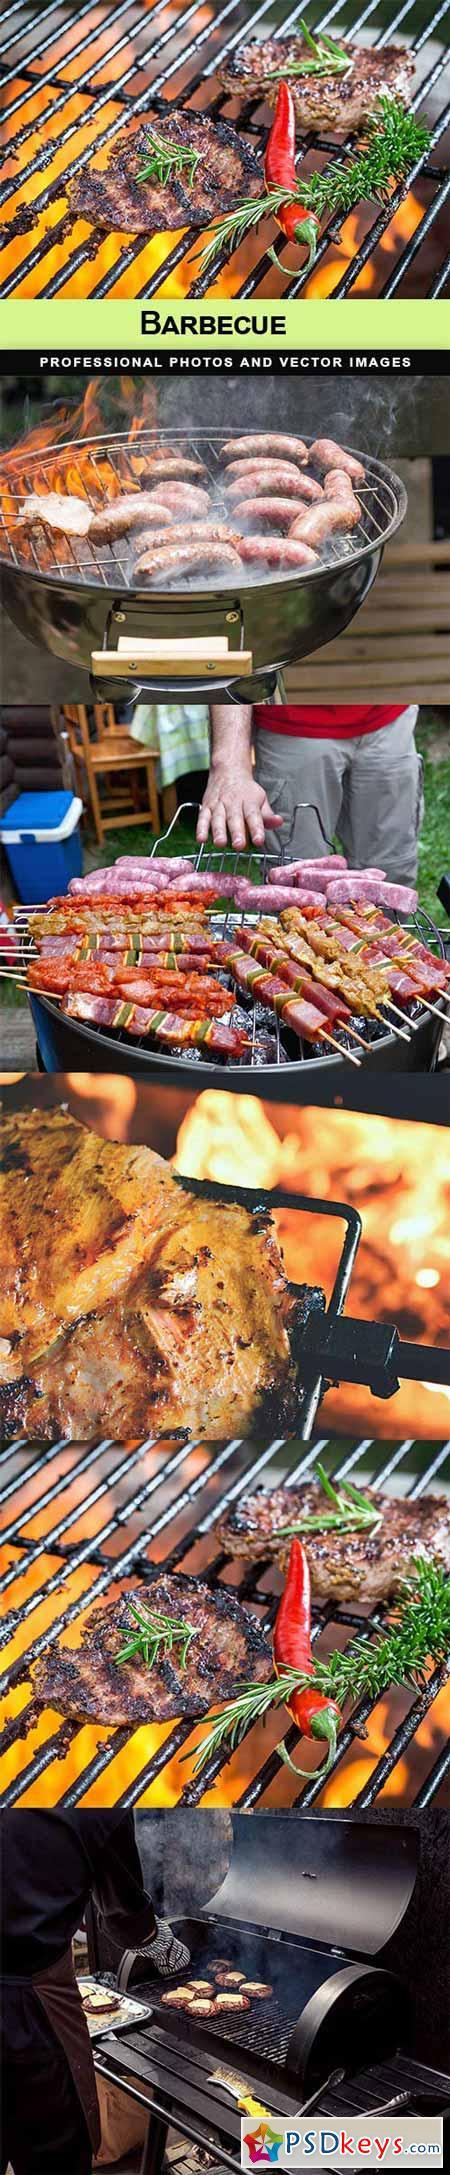 Barbecue - 5 UHQ JPEG